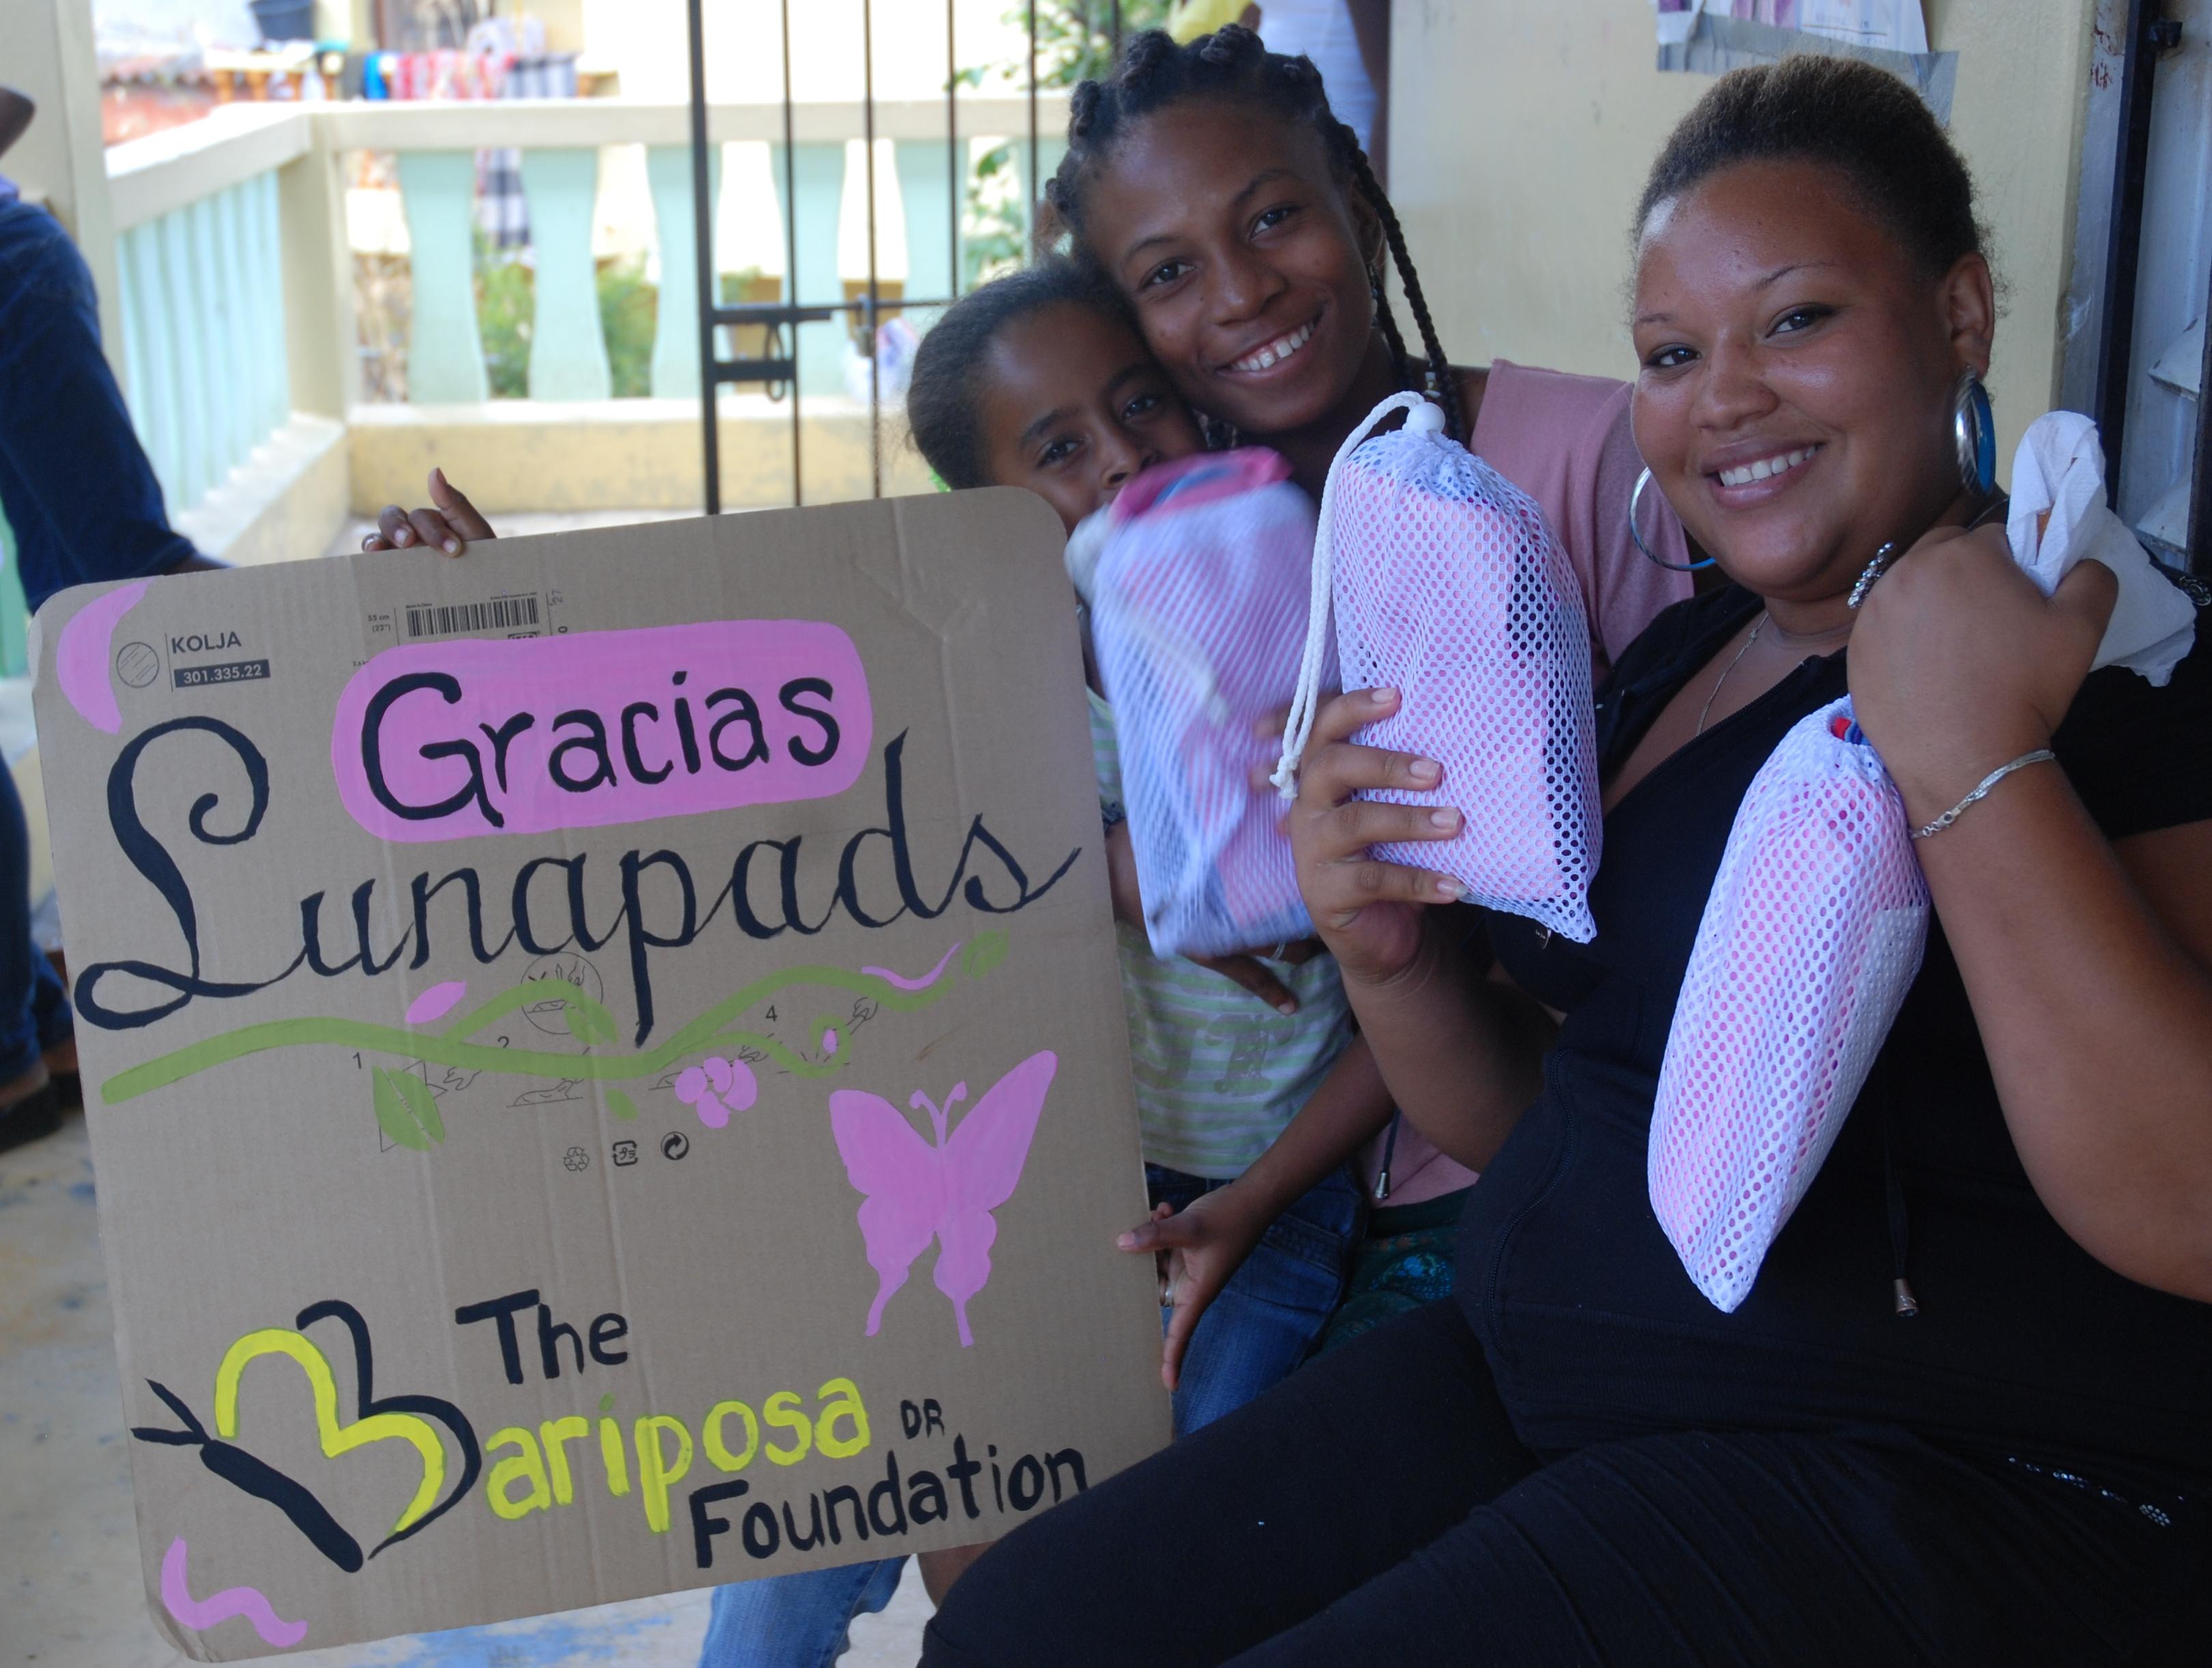 11-04-14 Lunapads Mariposa DR sign women.png